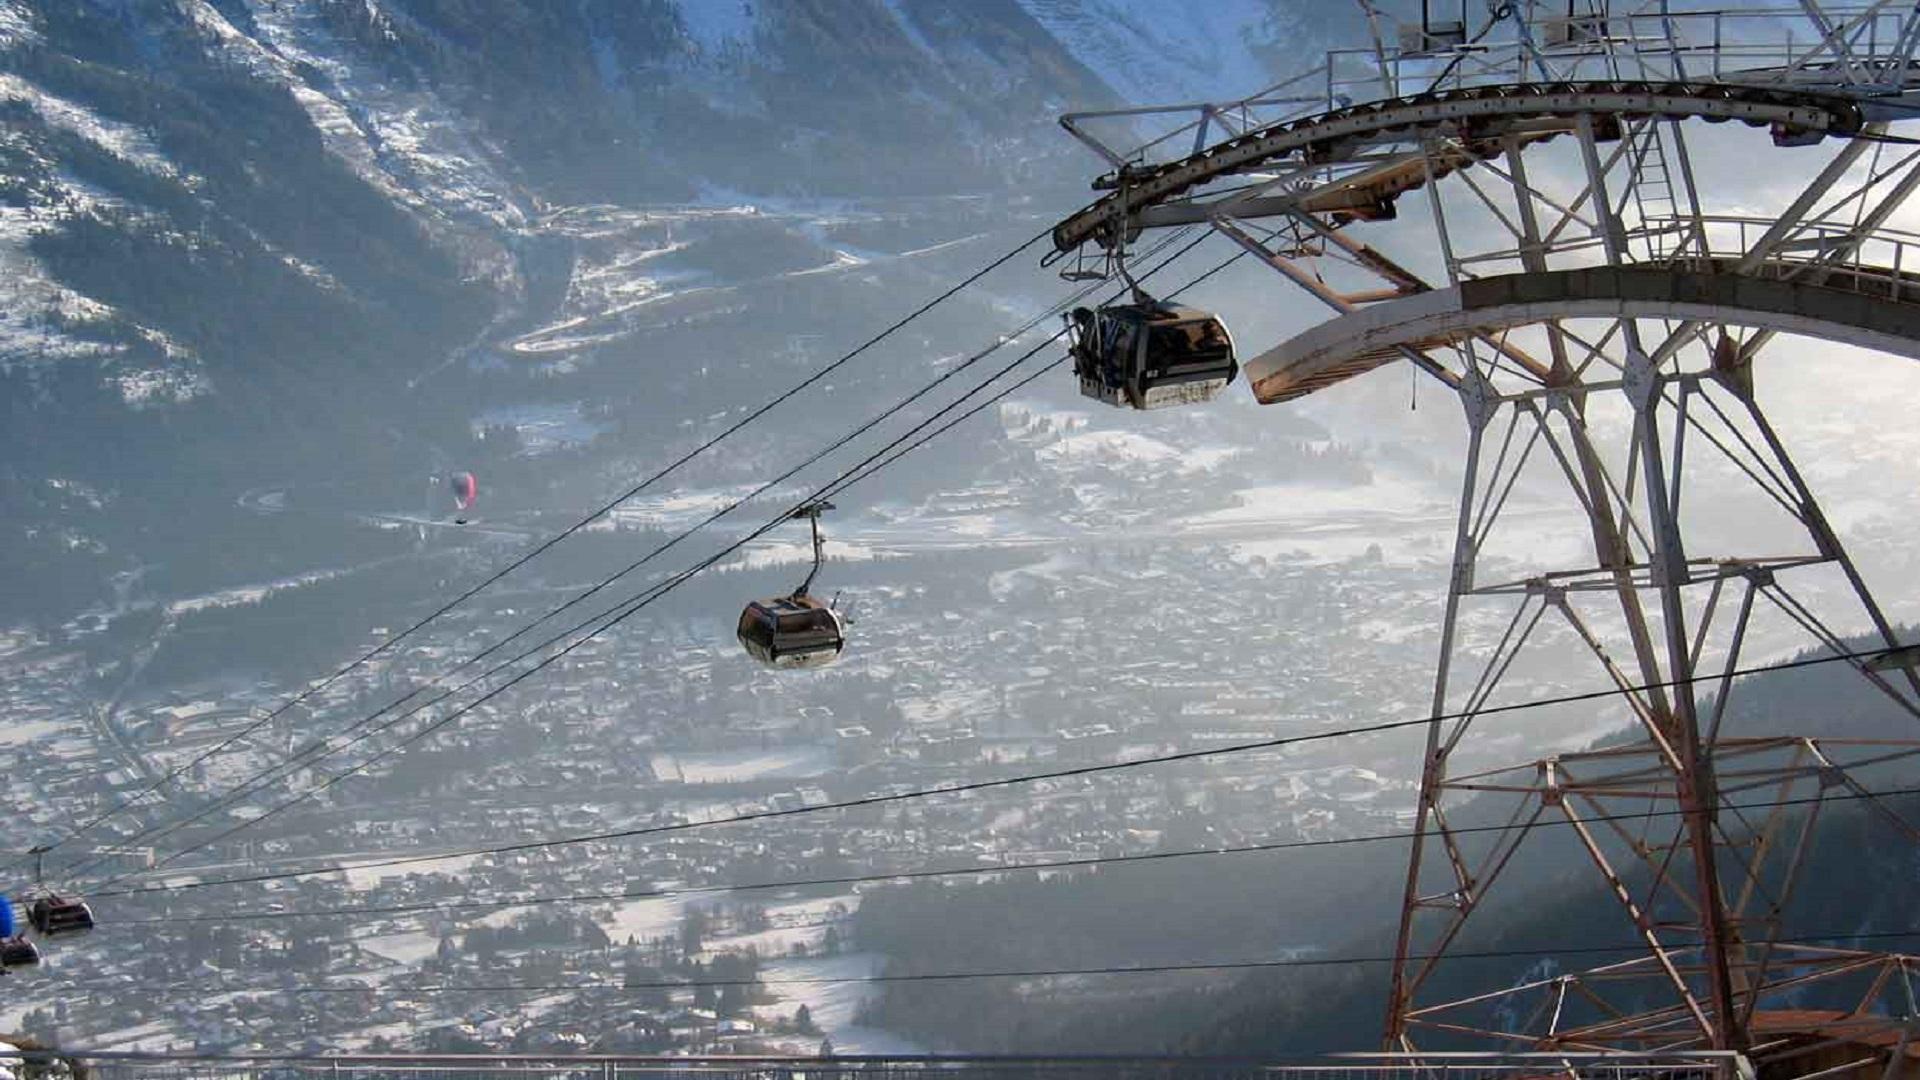 Himachal Pradesh to get two ropeways